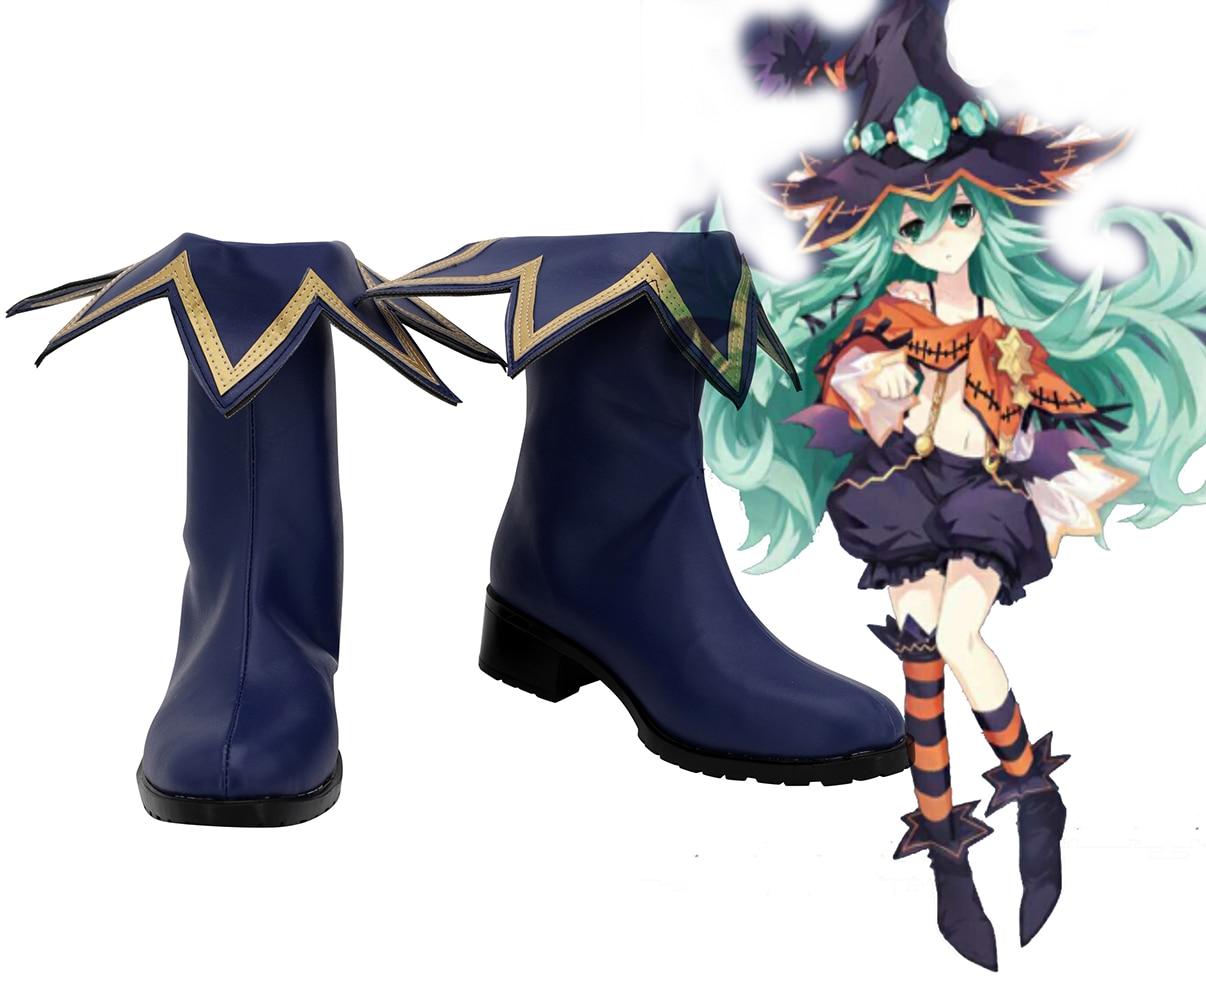 Botas azul para Cosplay de Date A Live 3 Youth Natsumi, zapatos hechos A medida para fiesta de Halloween, maquillaje Cosplay